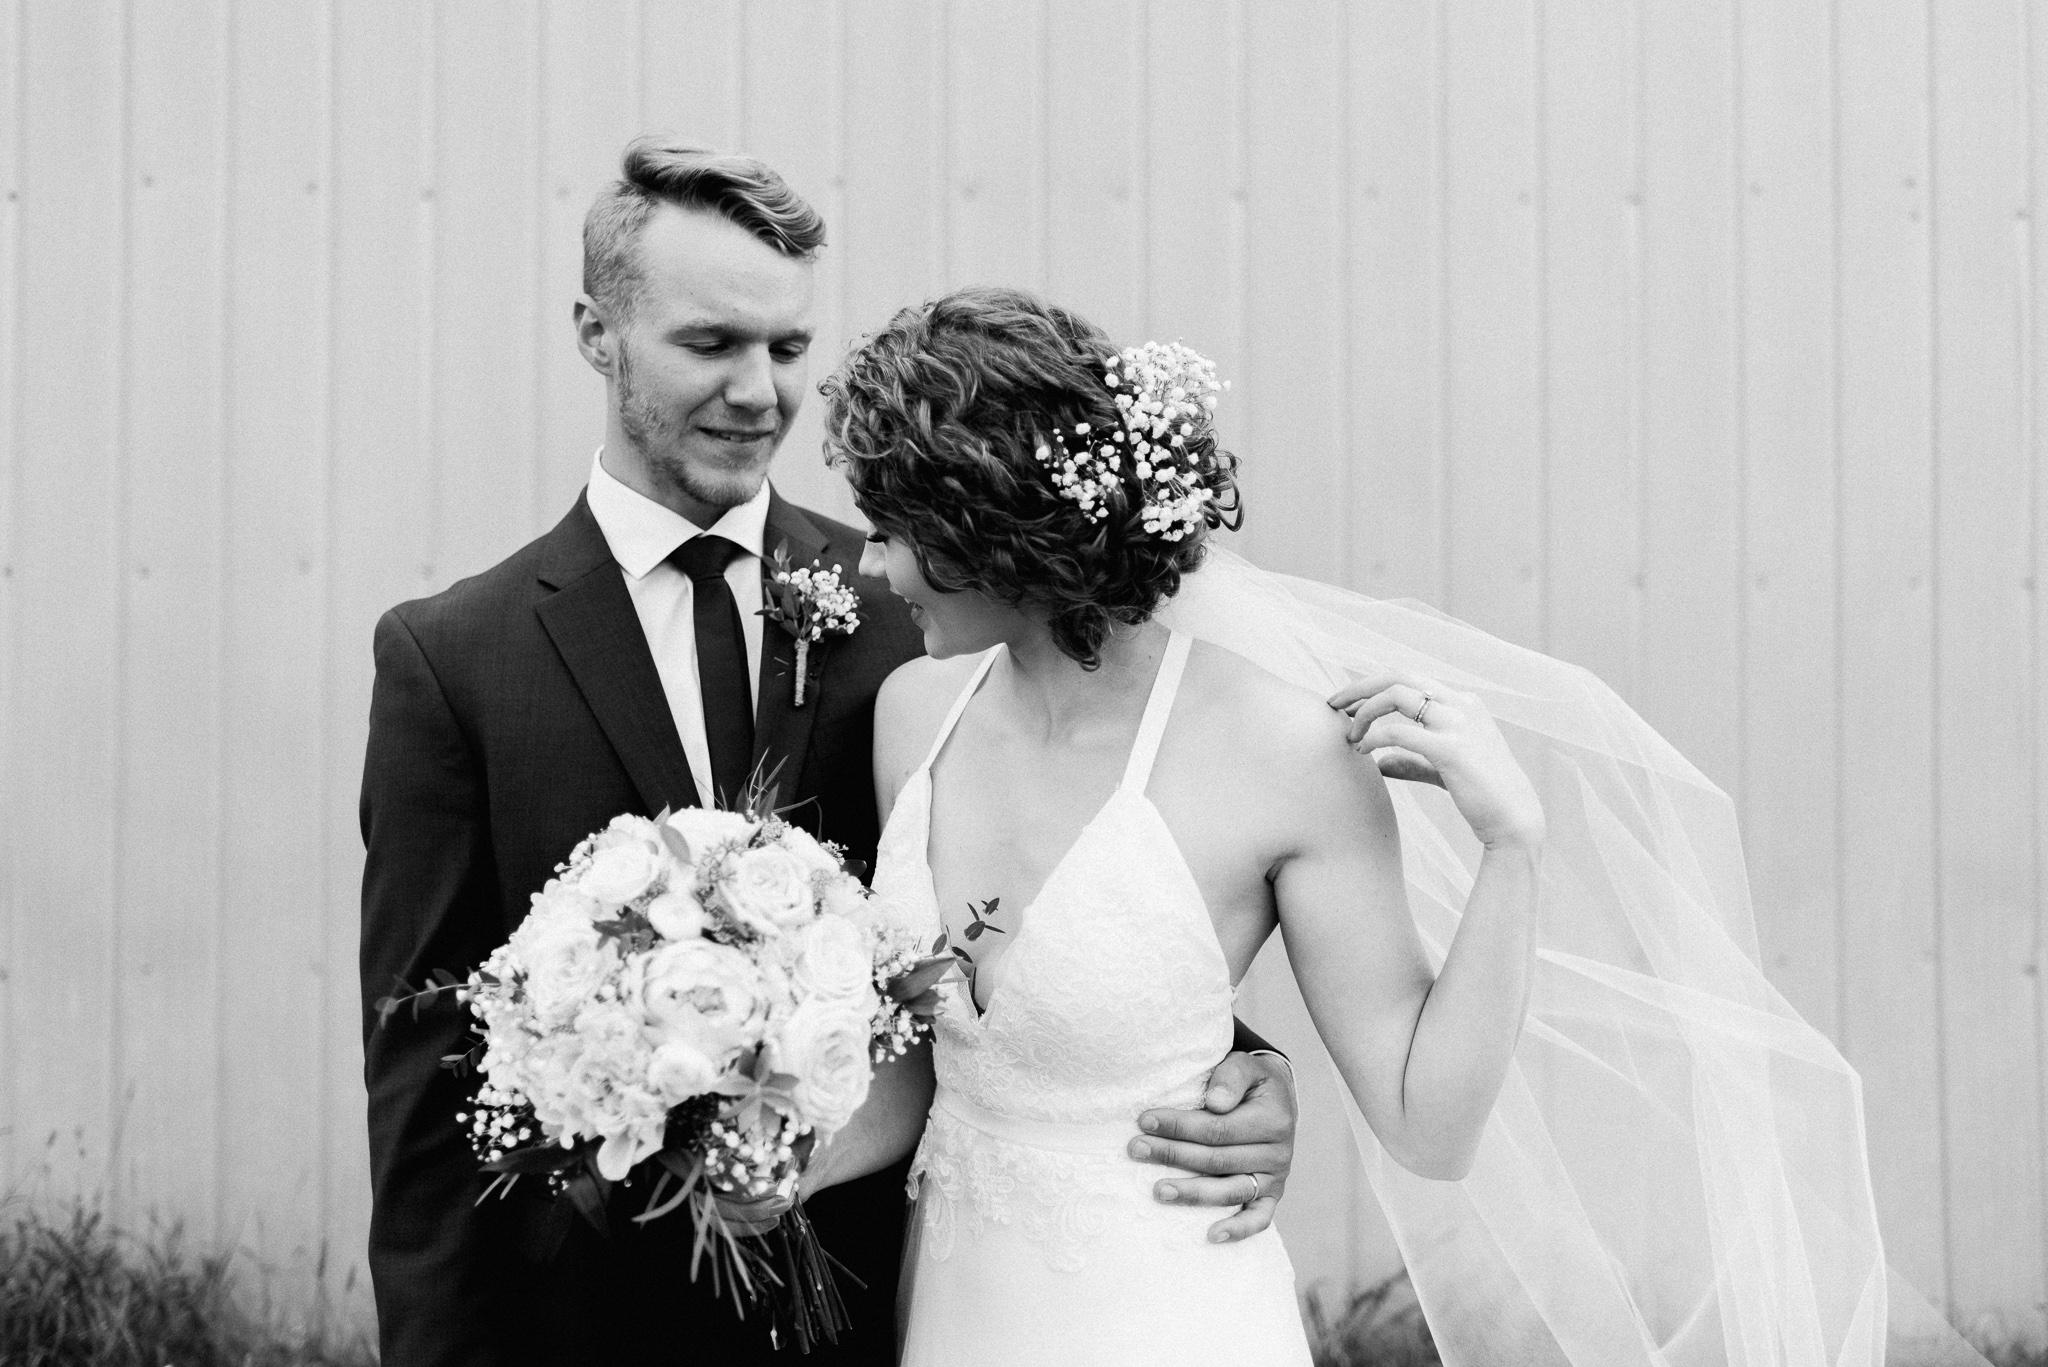 J&C-Weddingblog-43.jpg